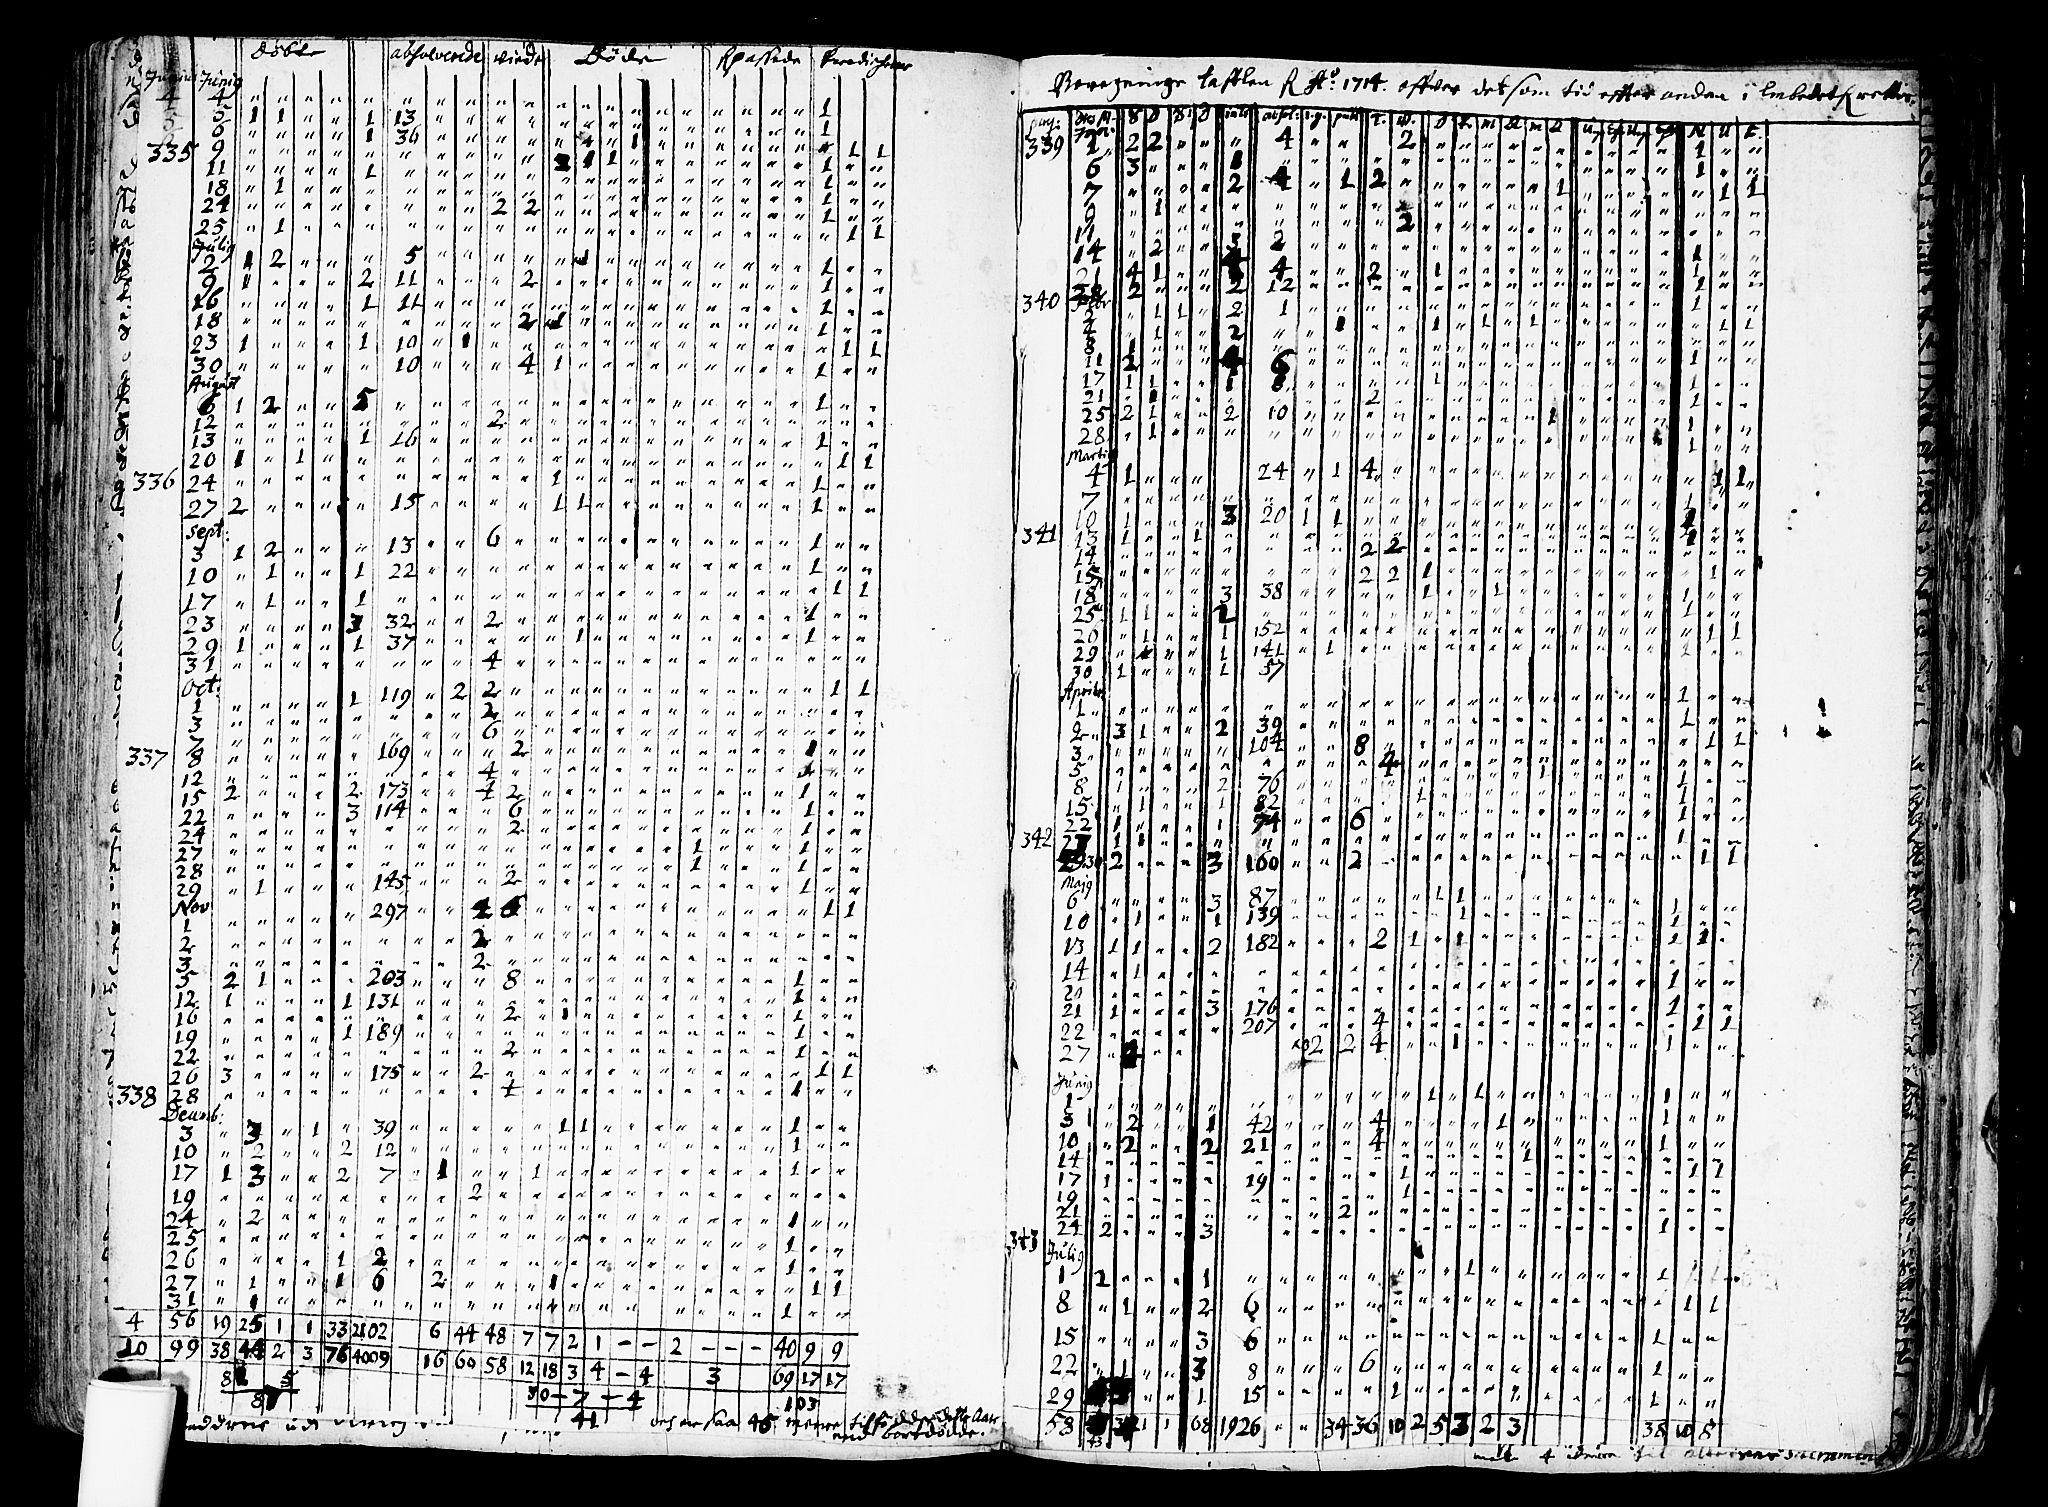 SAO, Nes prestekontor Kirkebøker, F/Fa/L0001: Ministerialbok nr. I 1, 1689-1716, s. 338c-338d